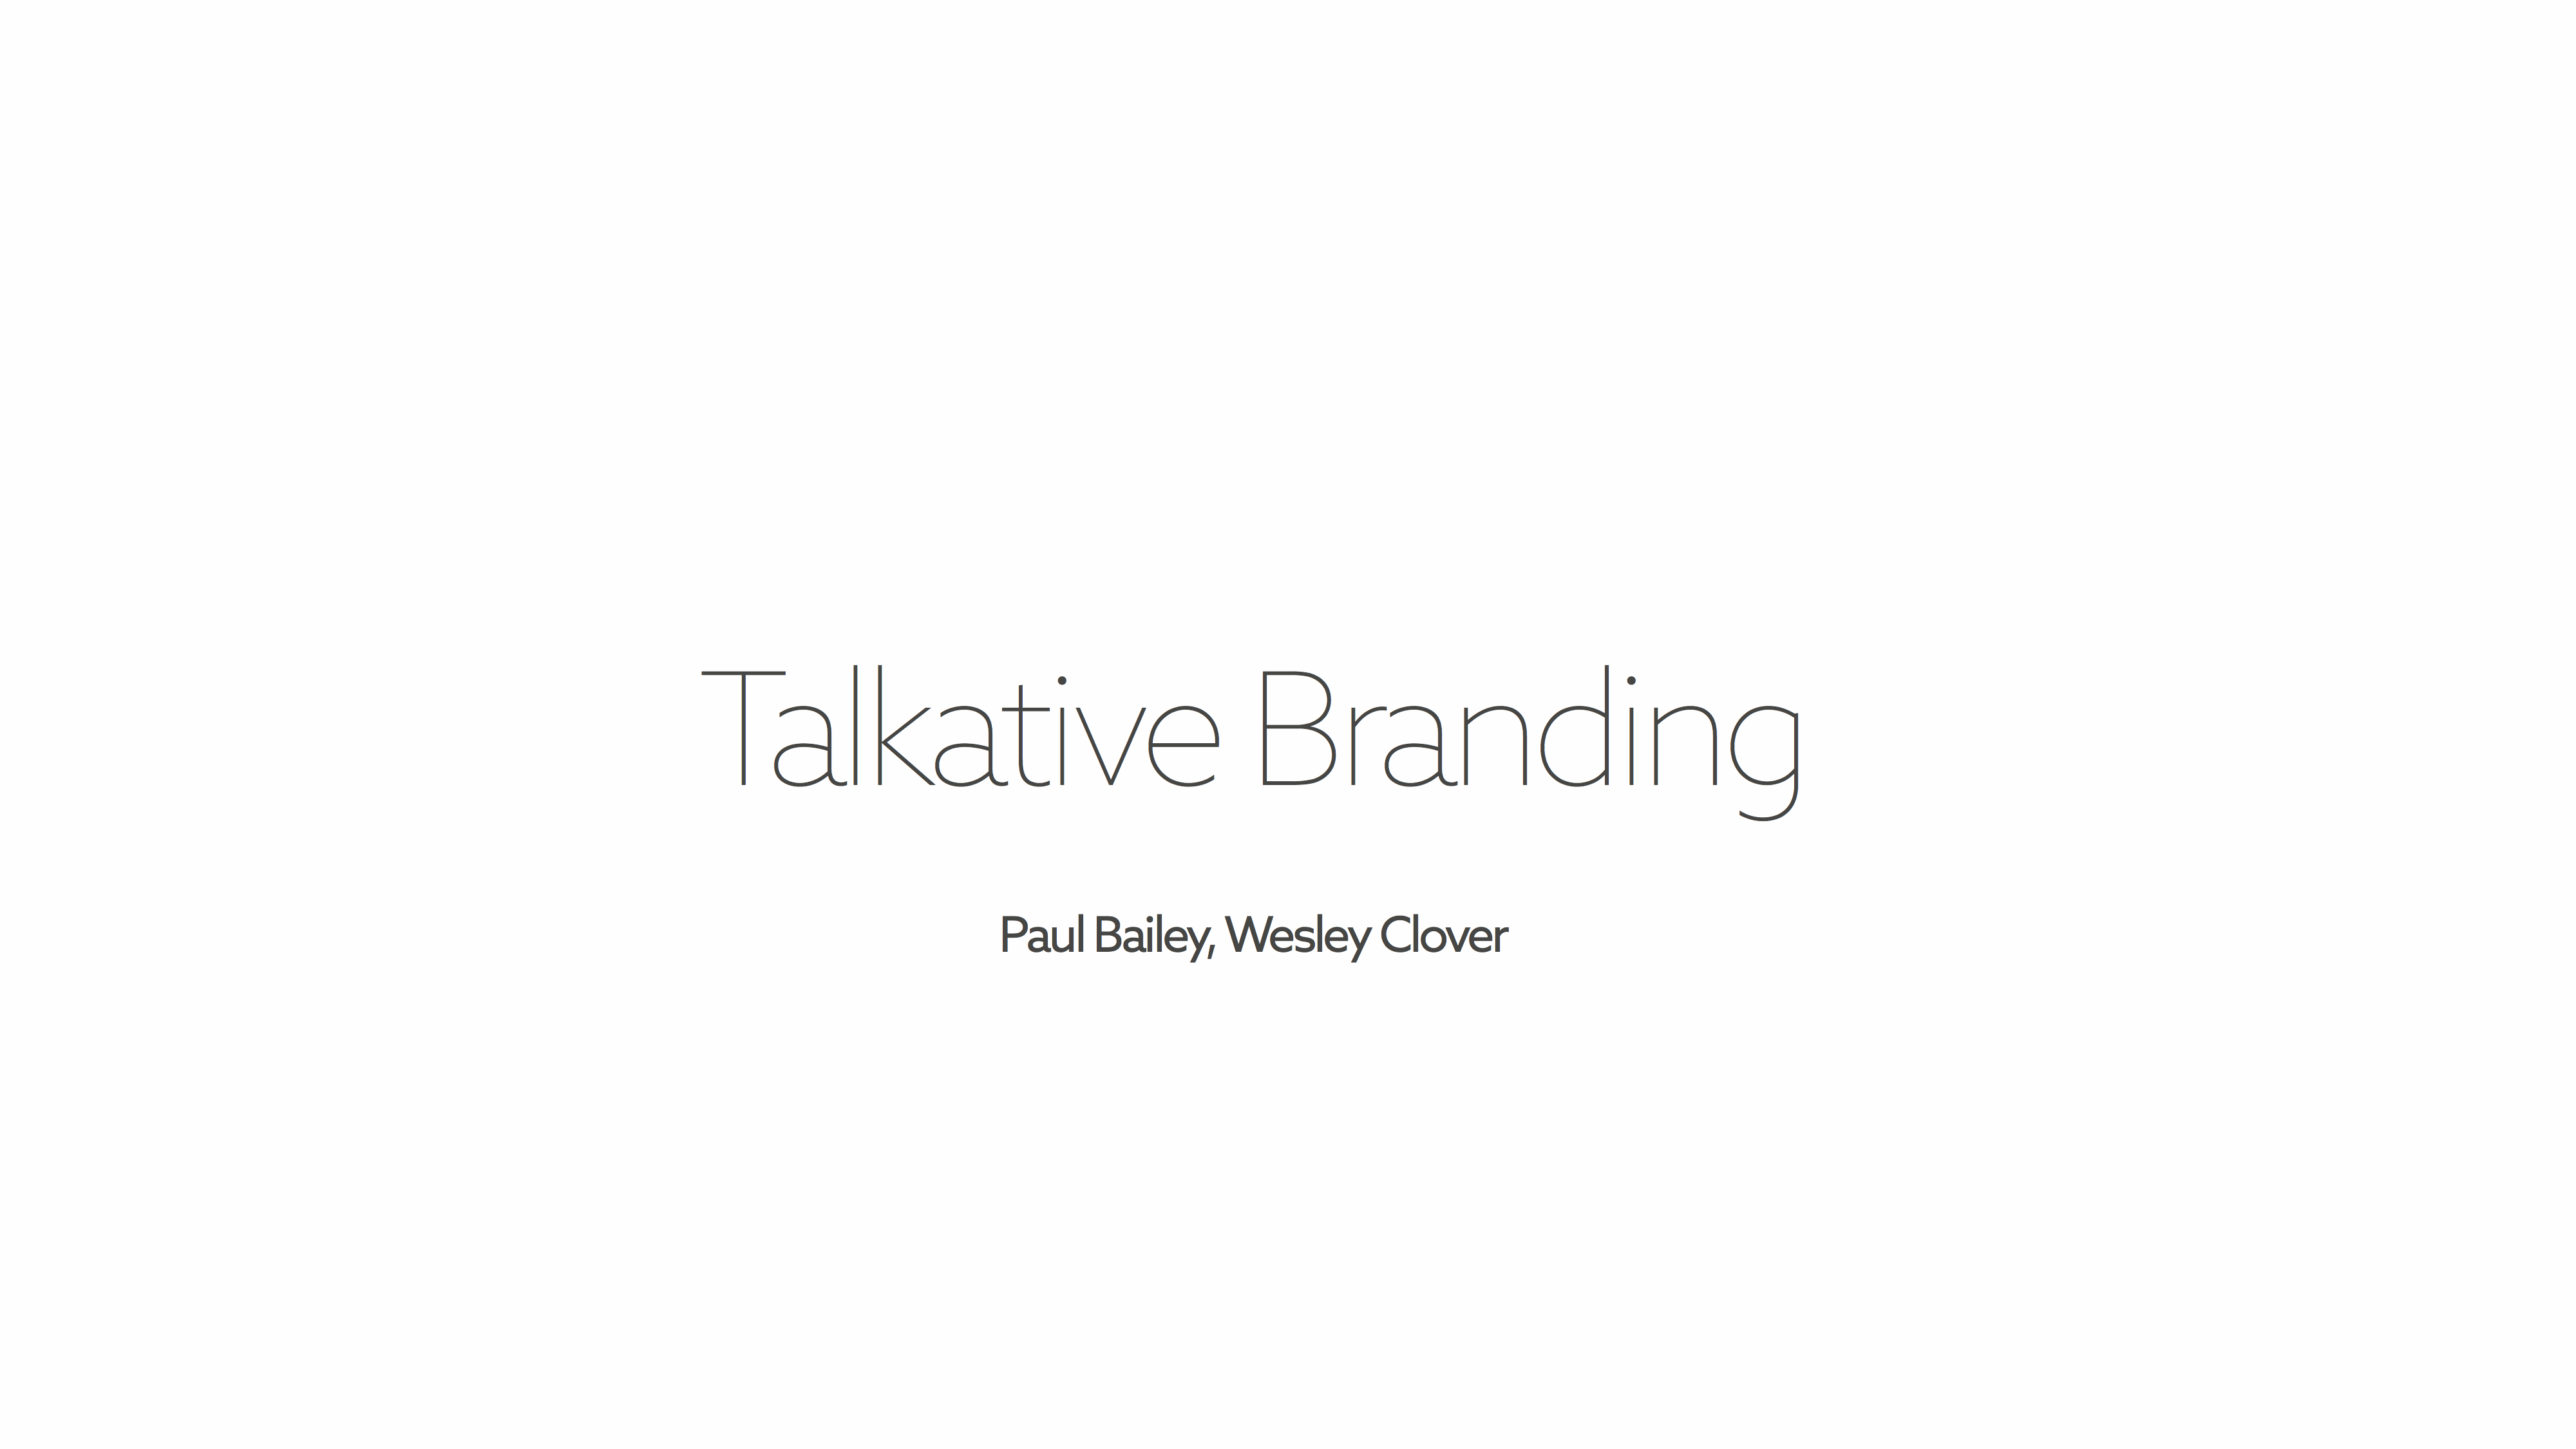 Talkative branding